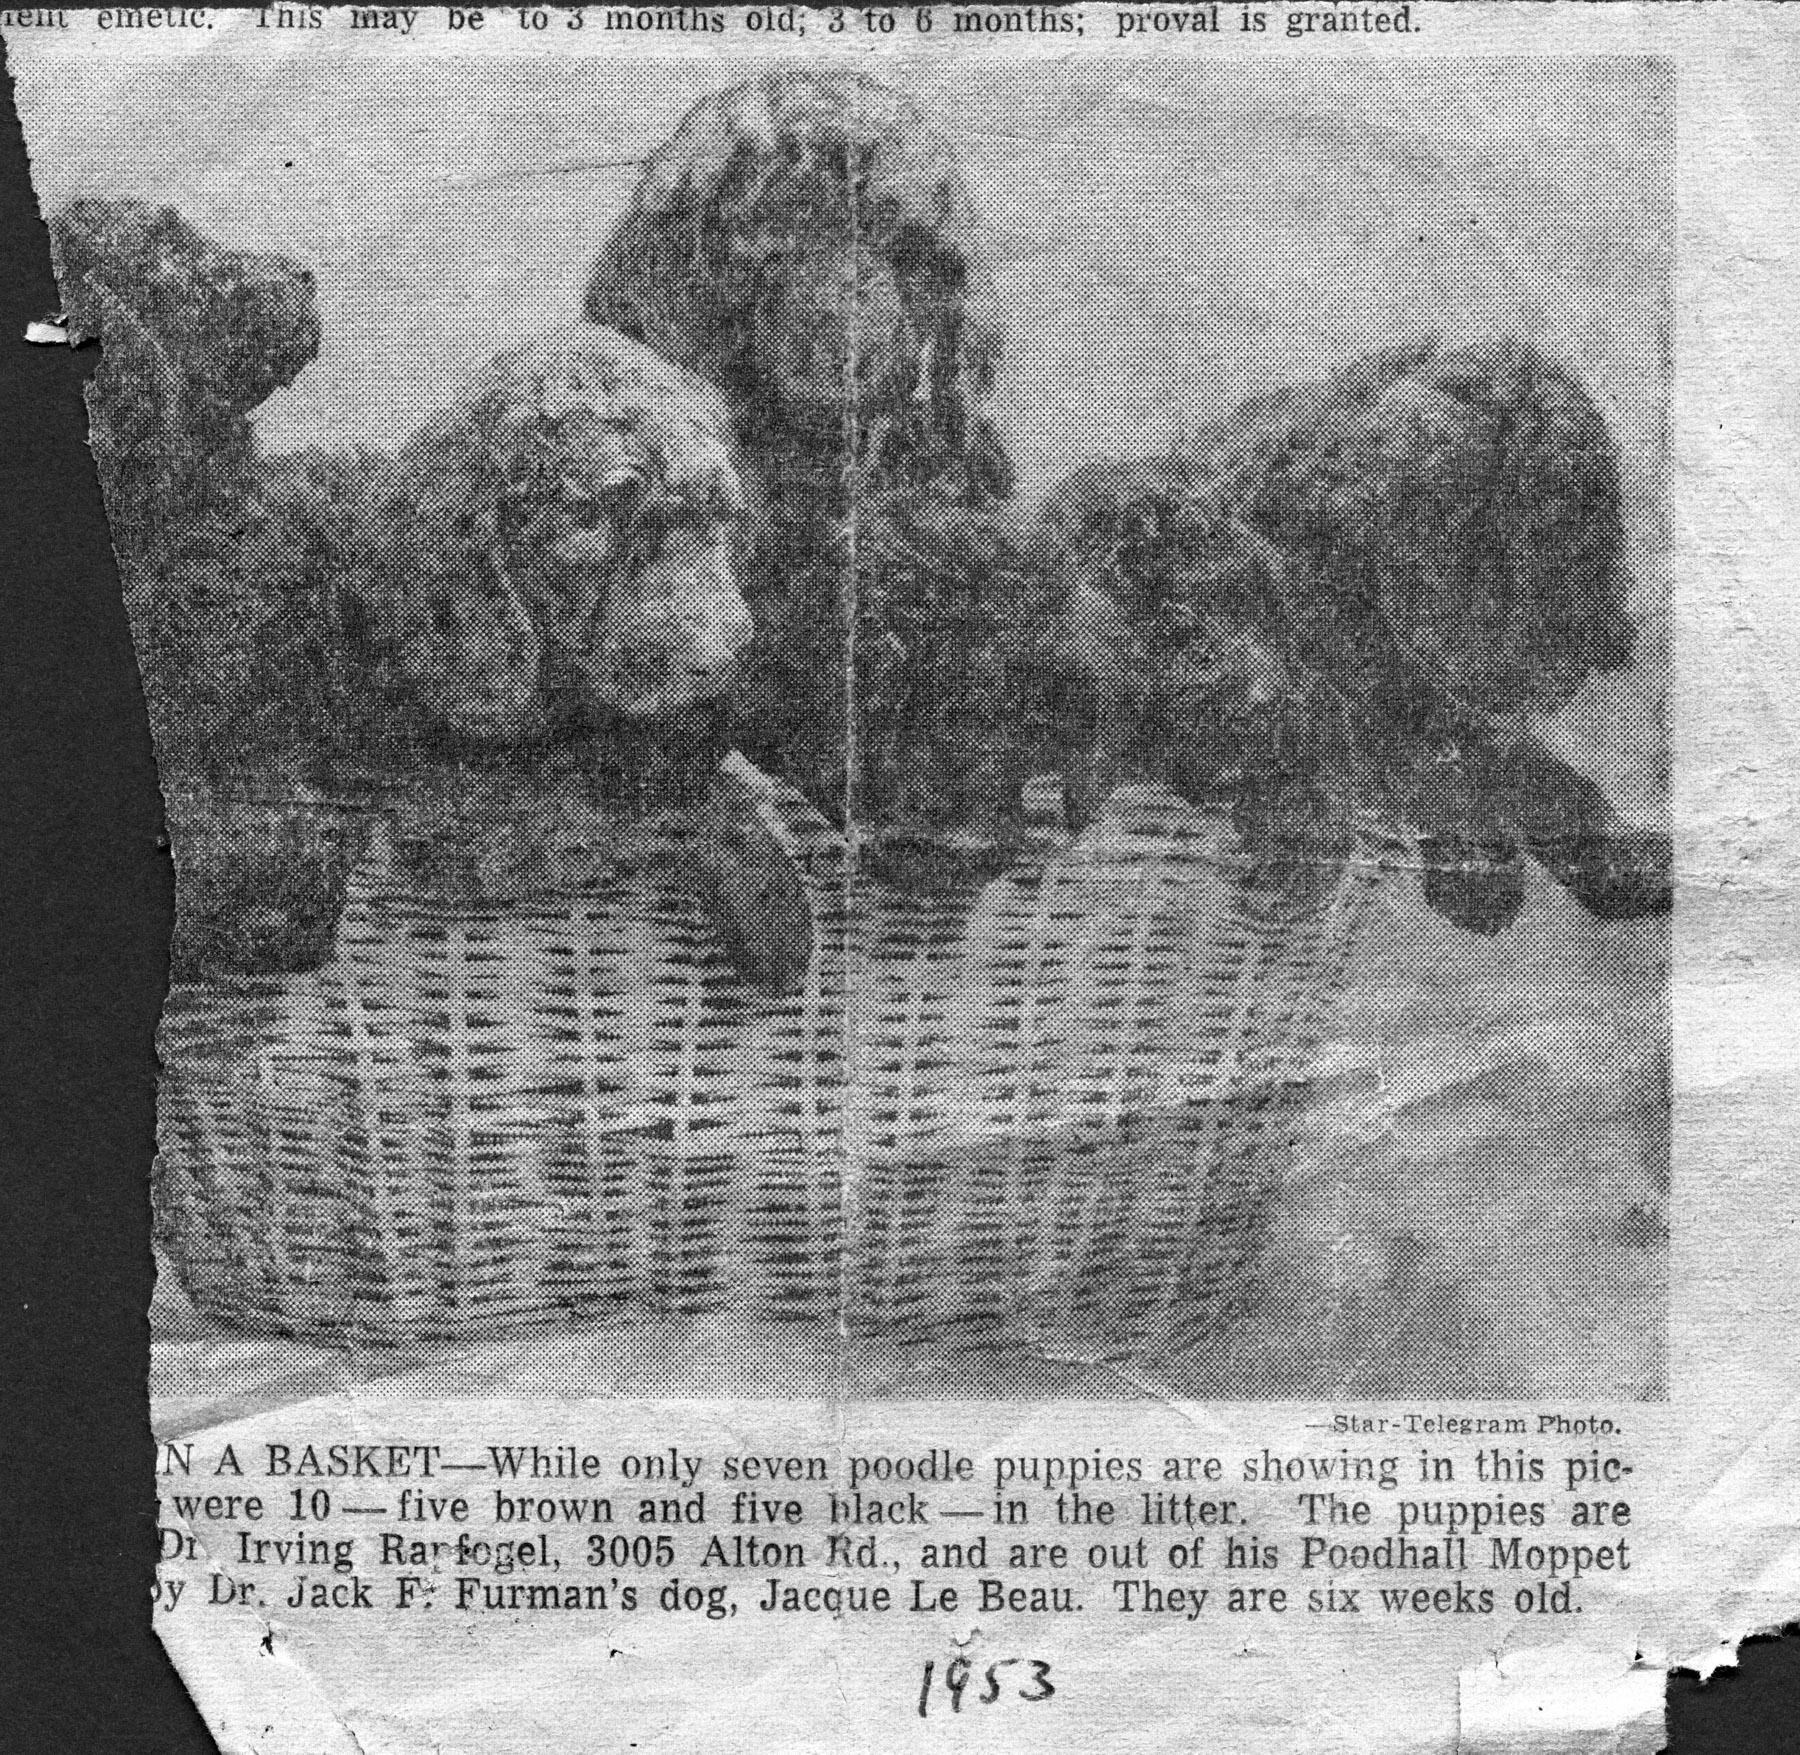 Mopsy Puppies_1953_1800px.jpg